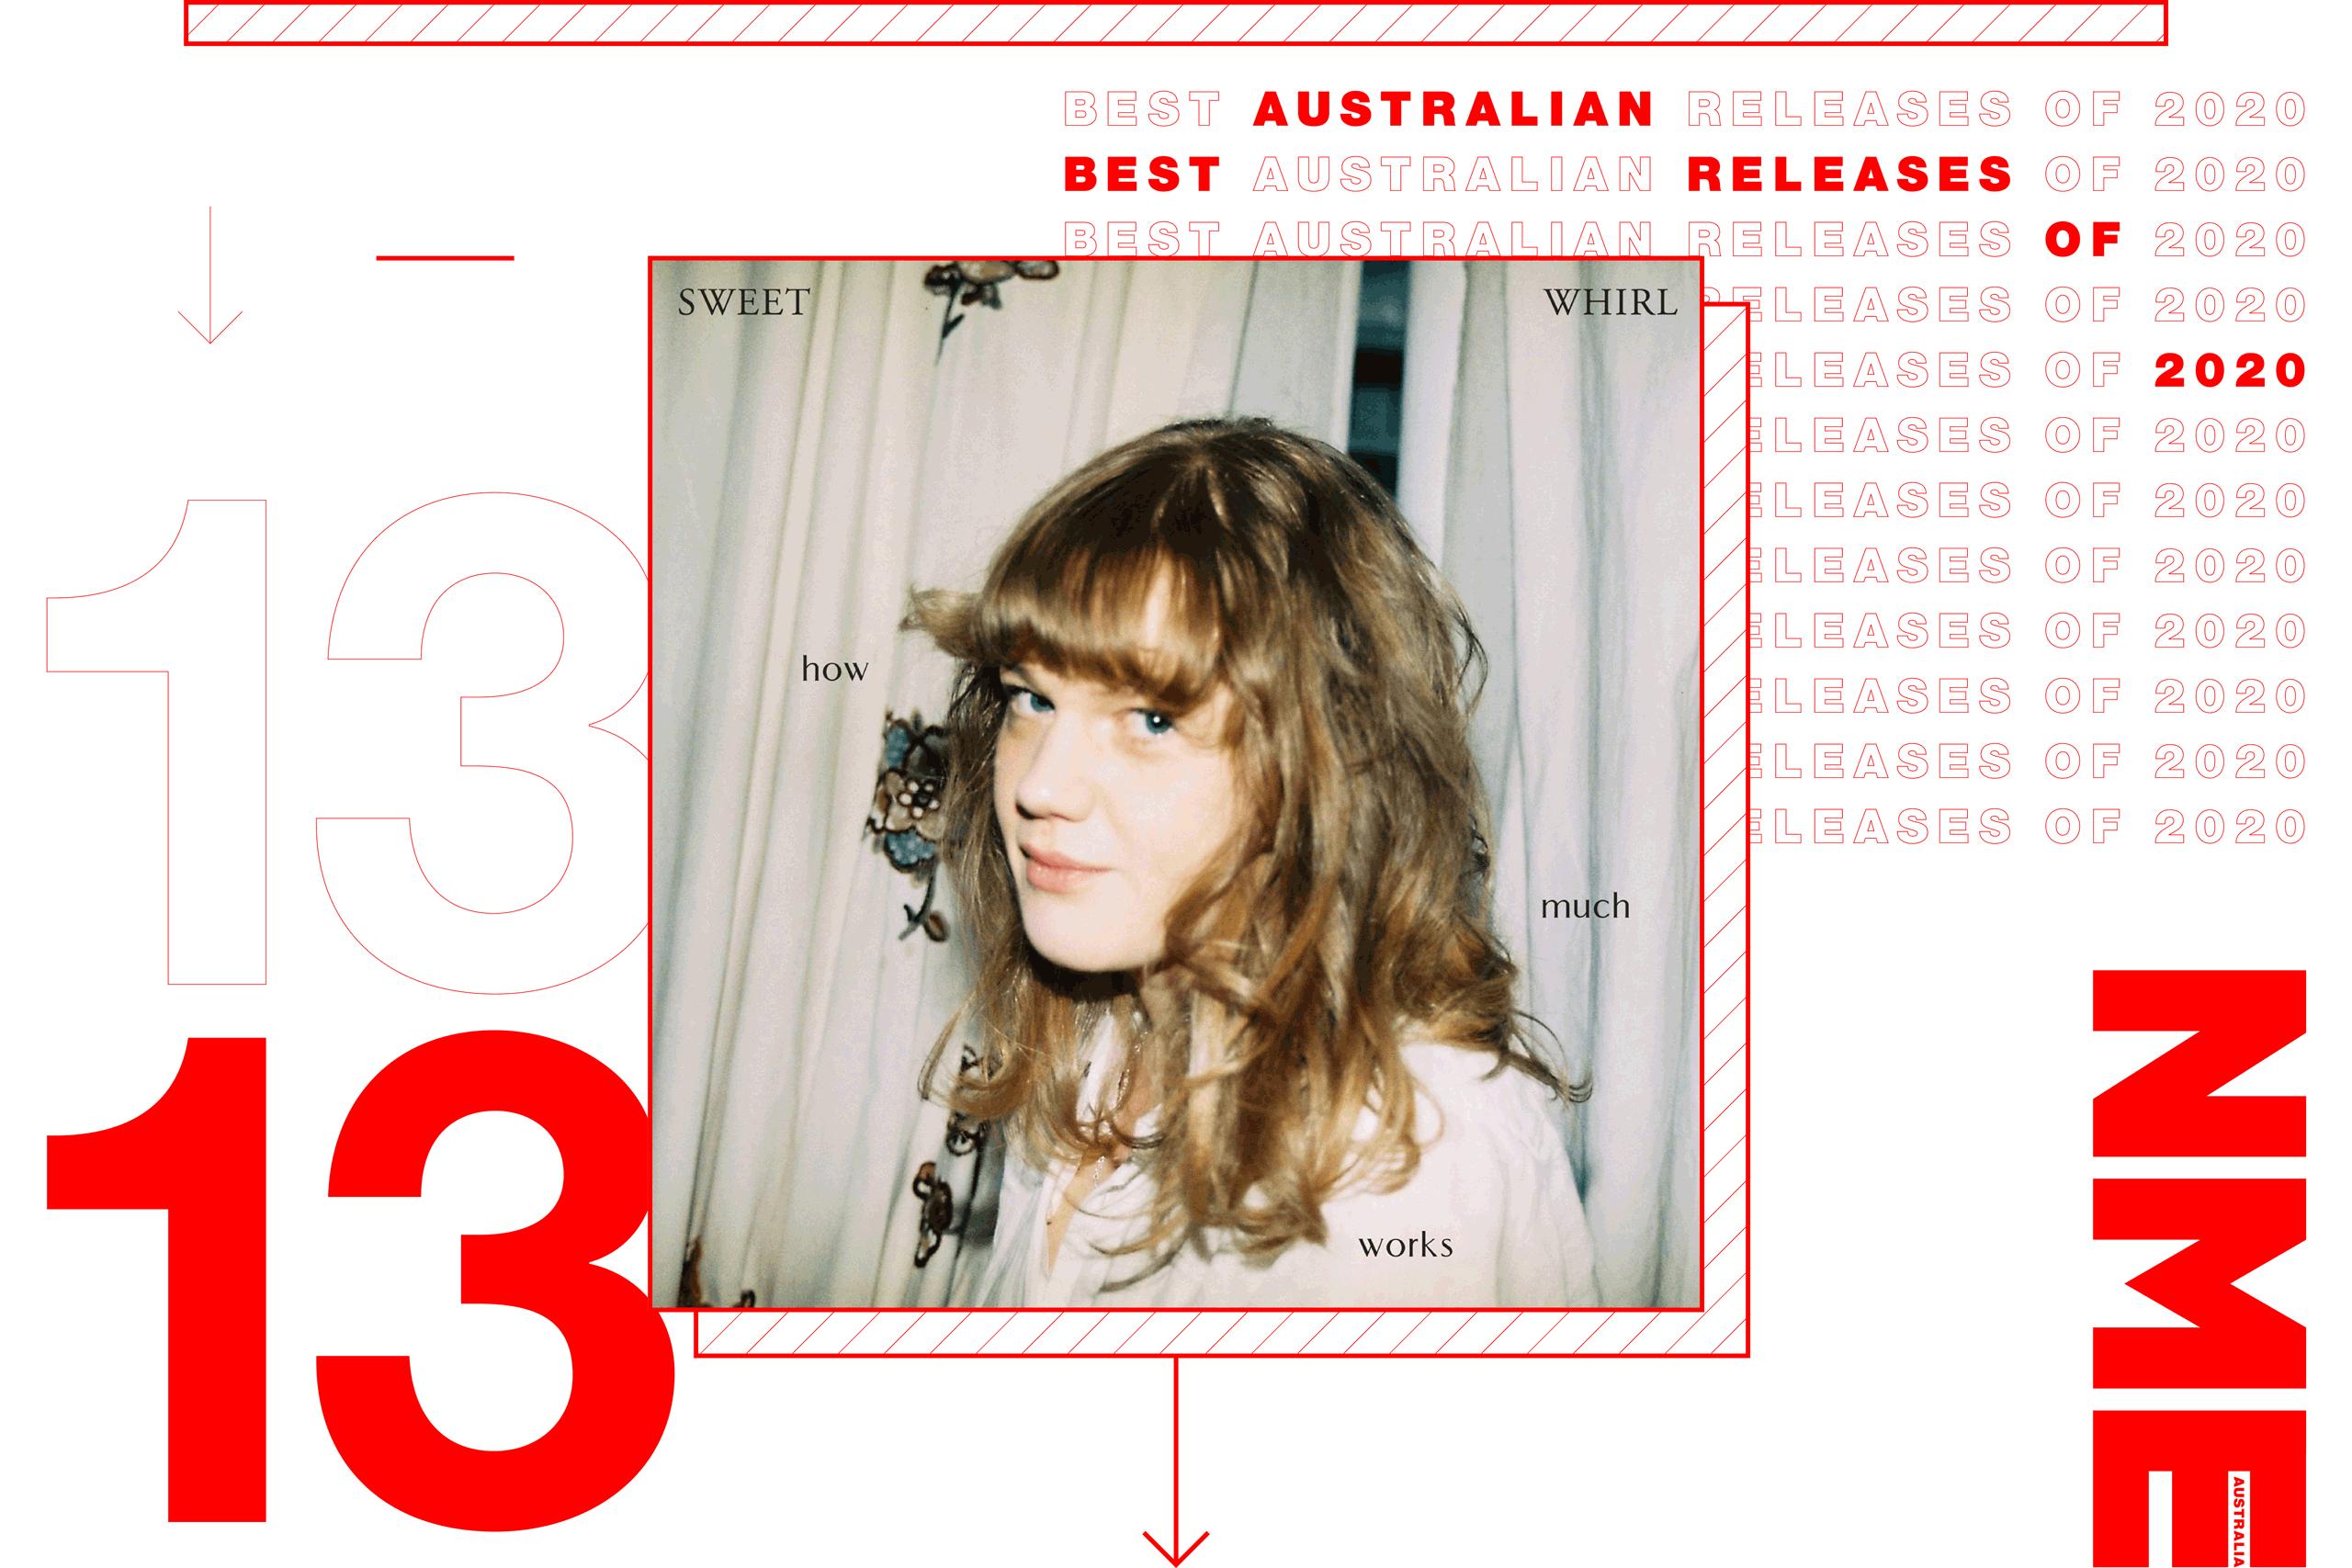 NME Australian Album Release 13